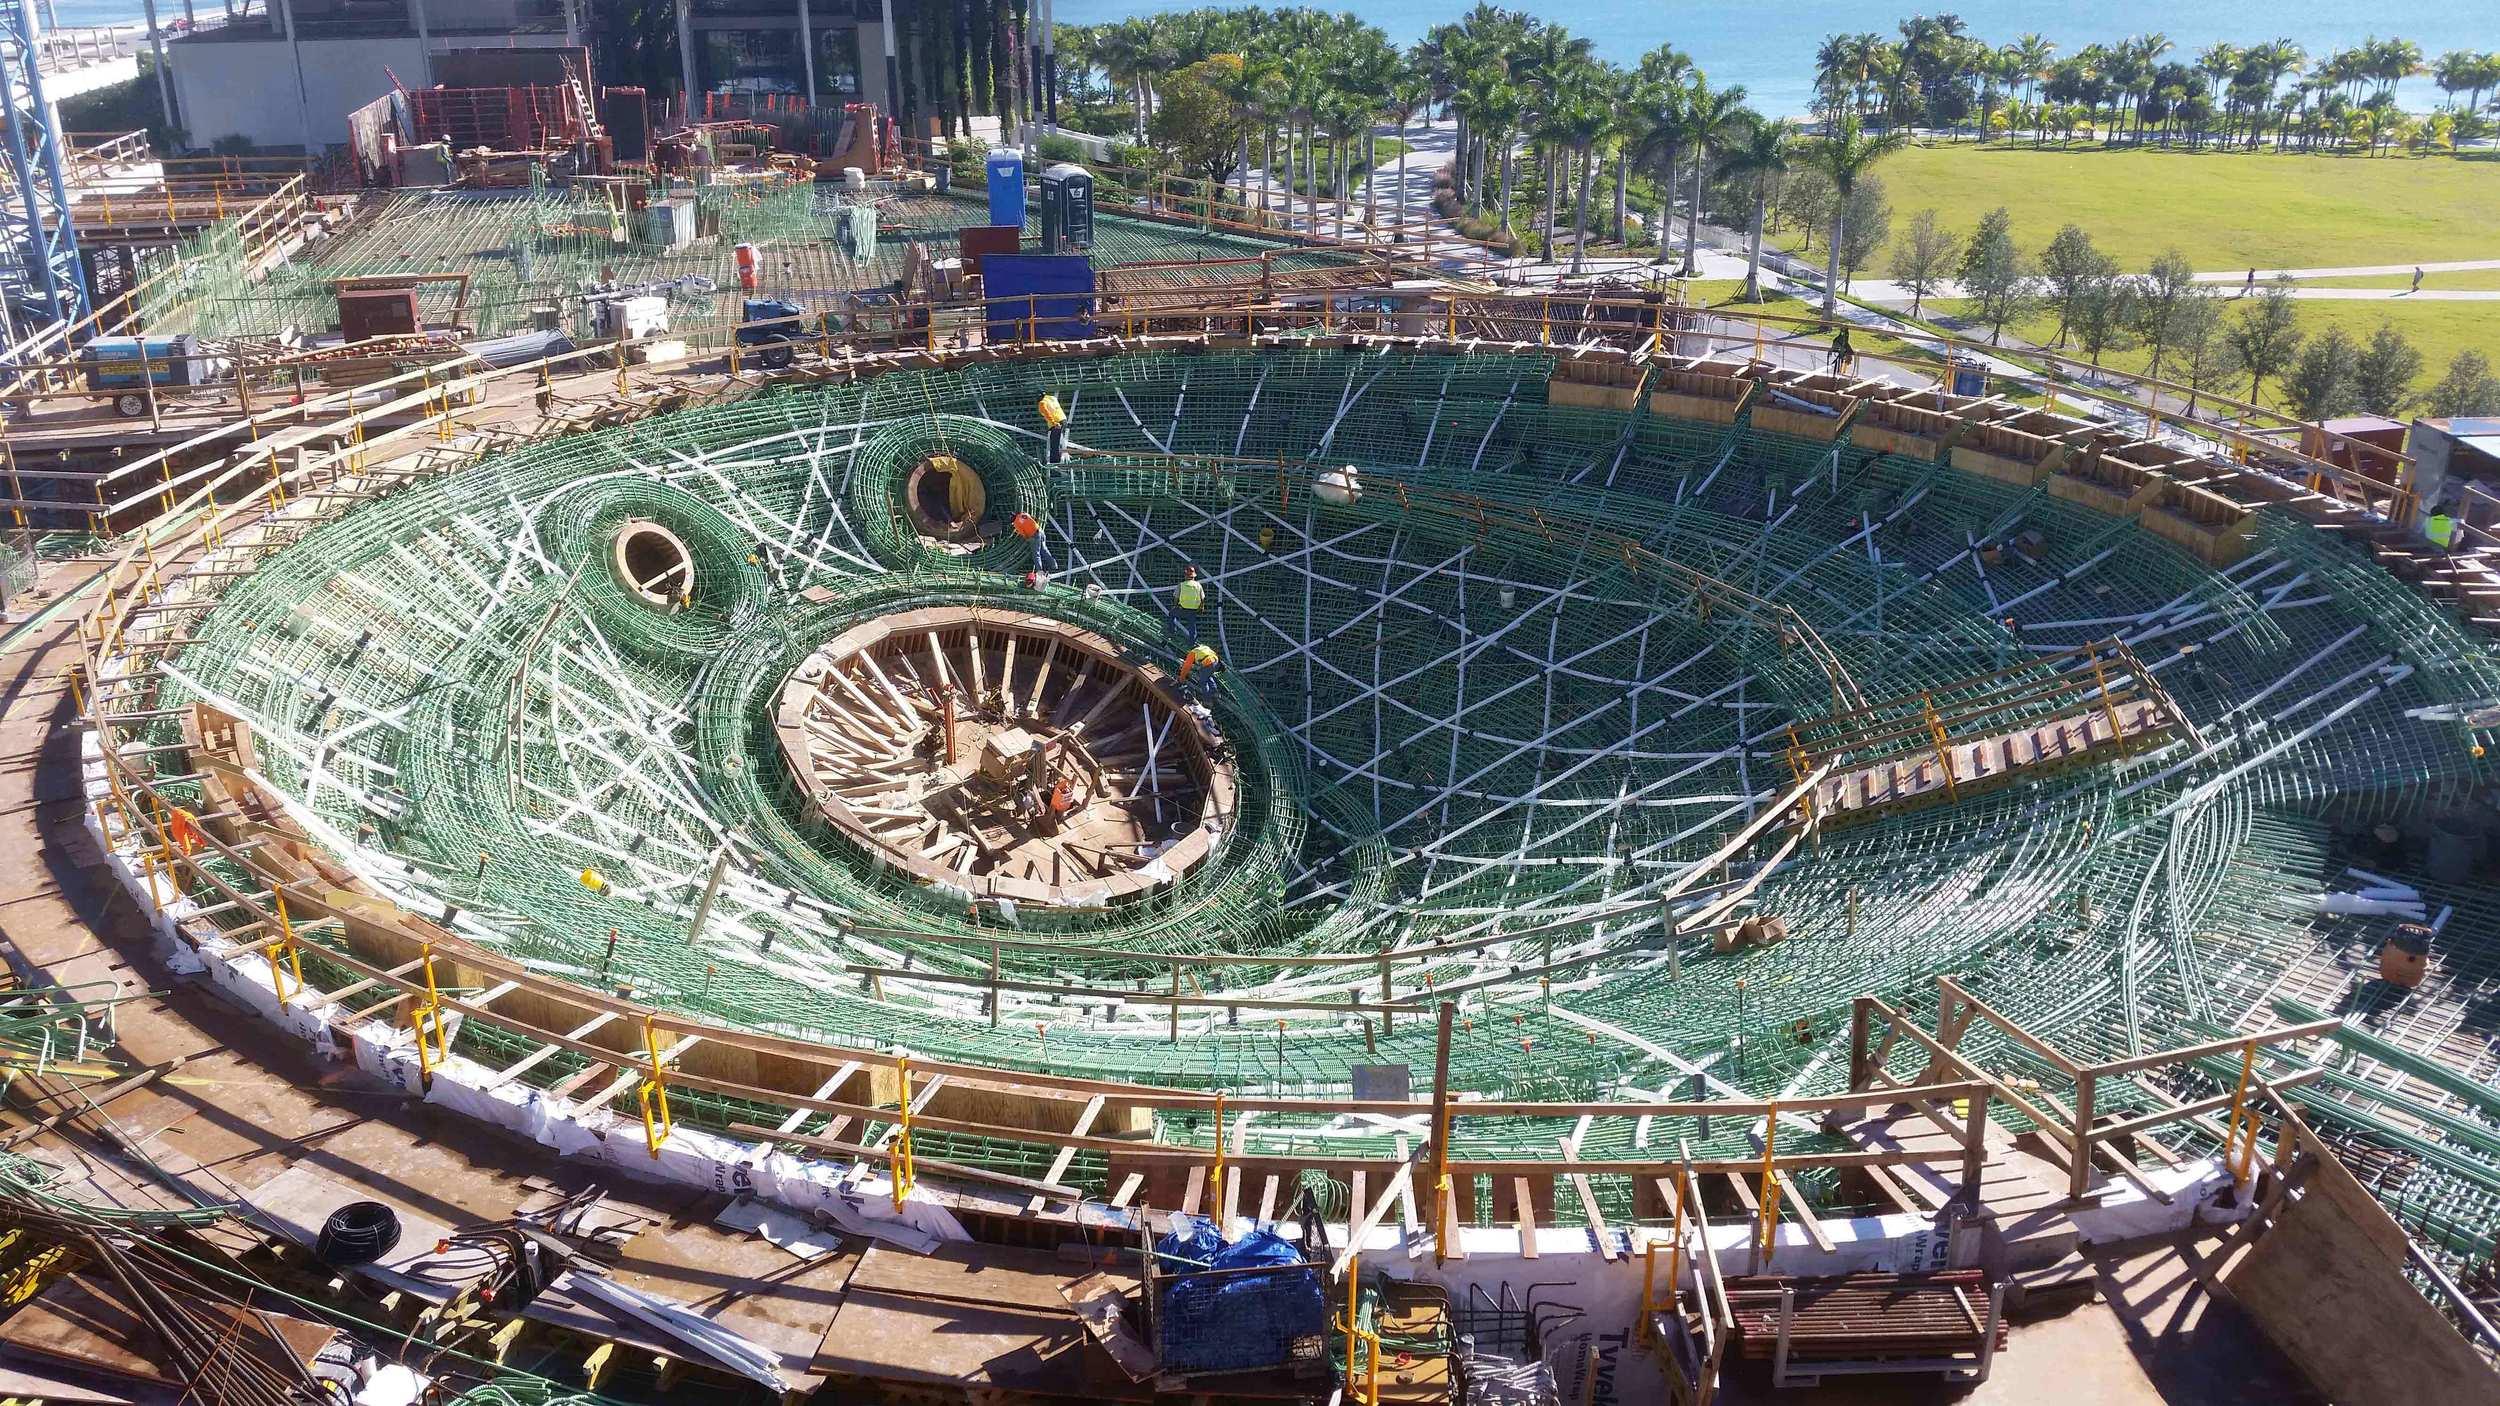 gulf-stream-tank-miami-fl-science-museum.jpg